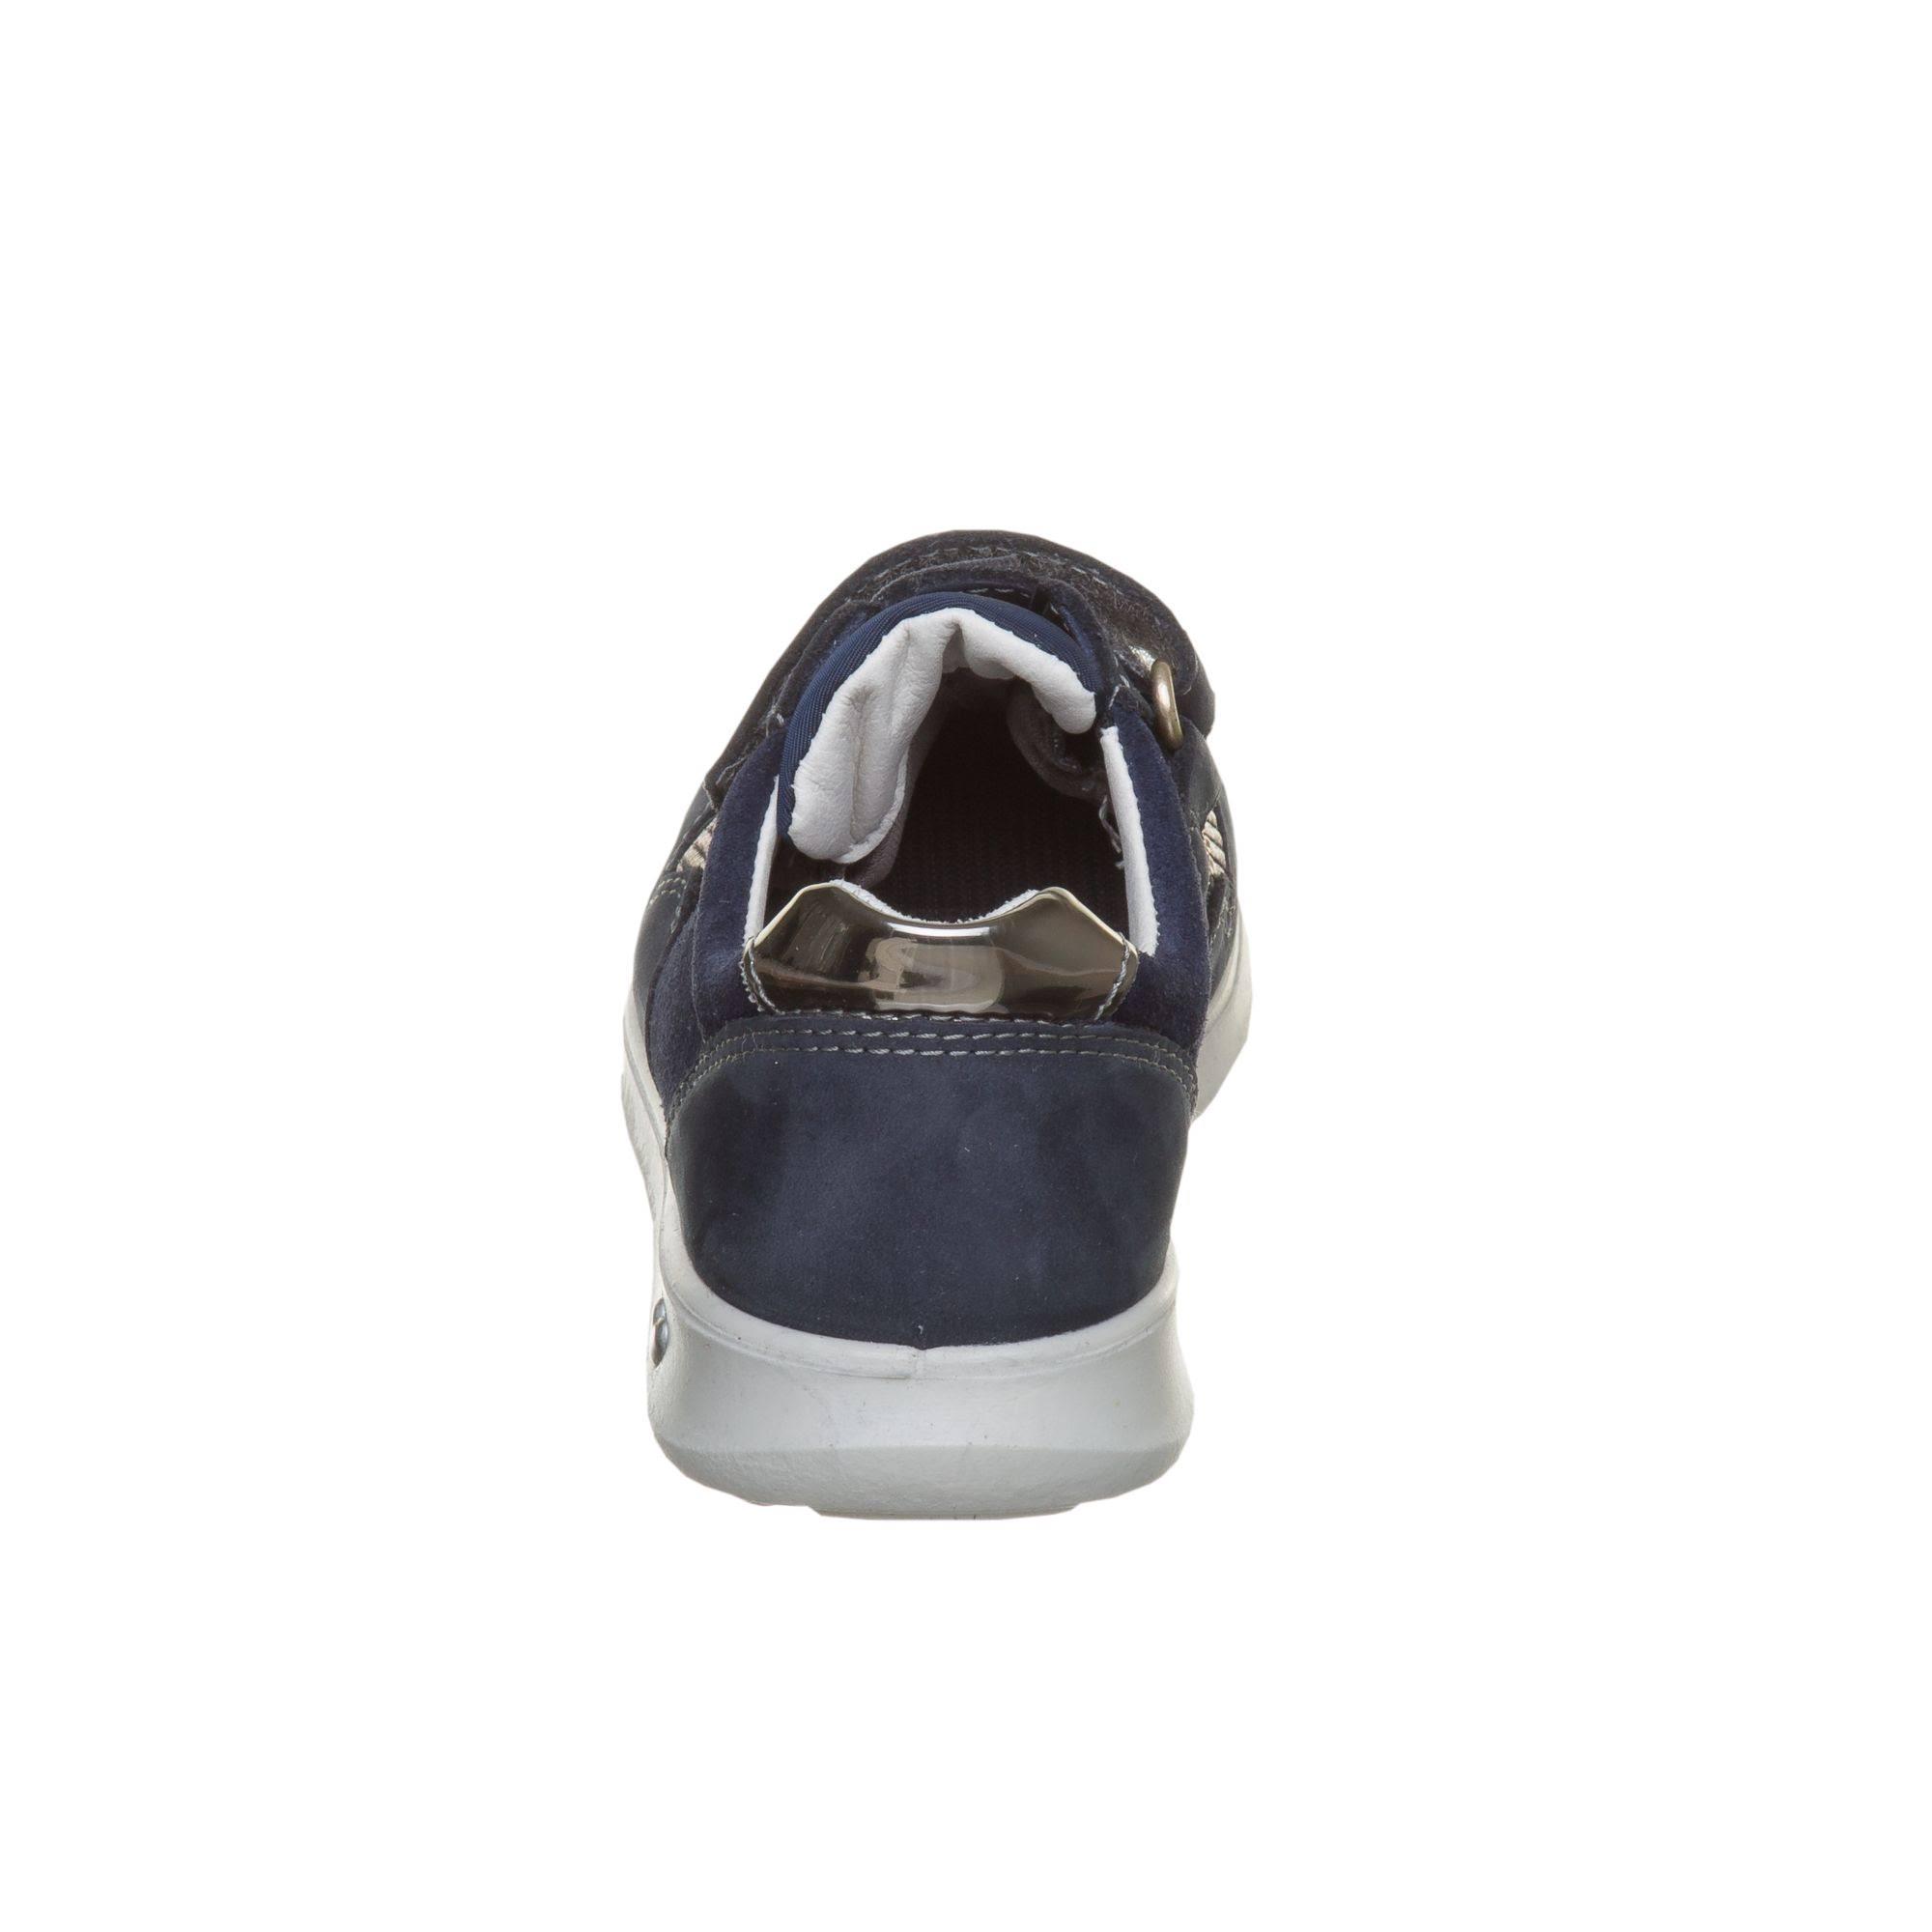 31 Schnürschuh nautic Kinder 5823300 173 Eu Ricosta Milana Blau Unisex XqOTnB0w